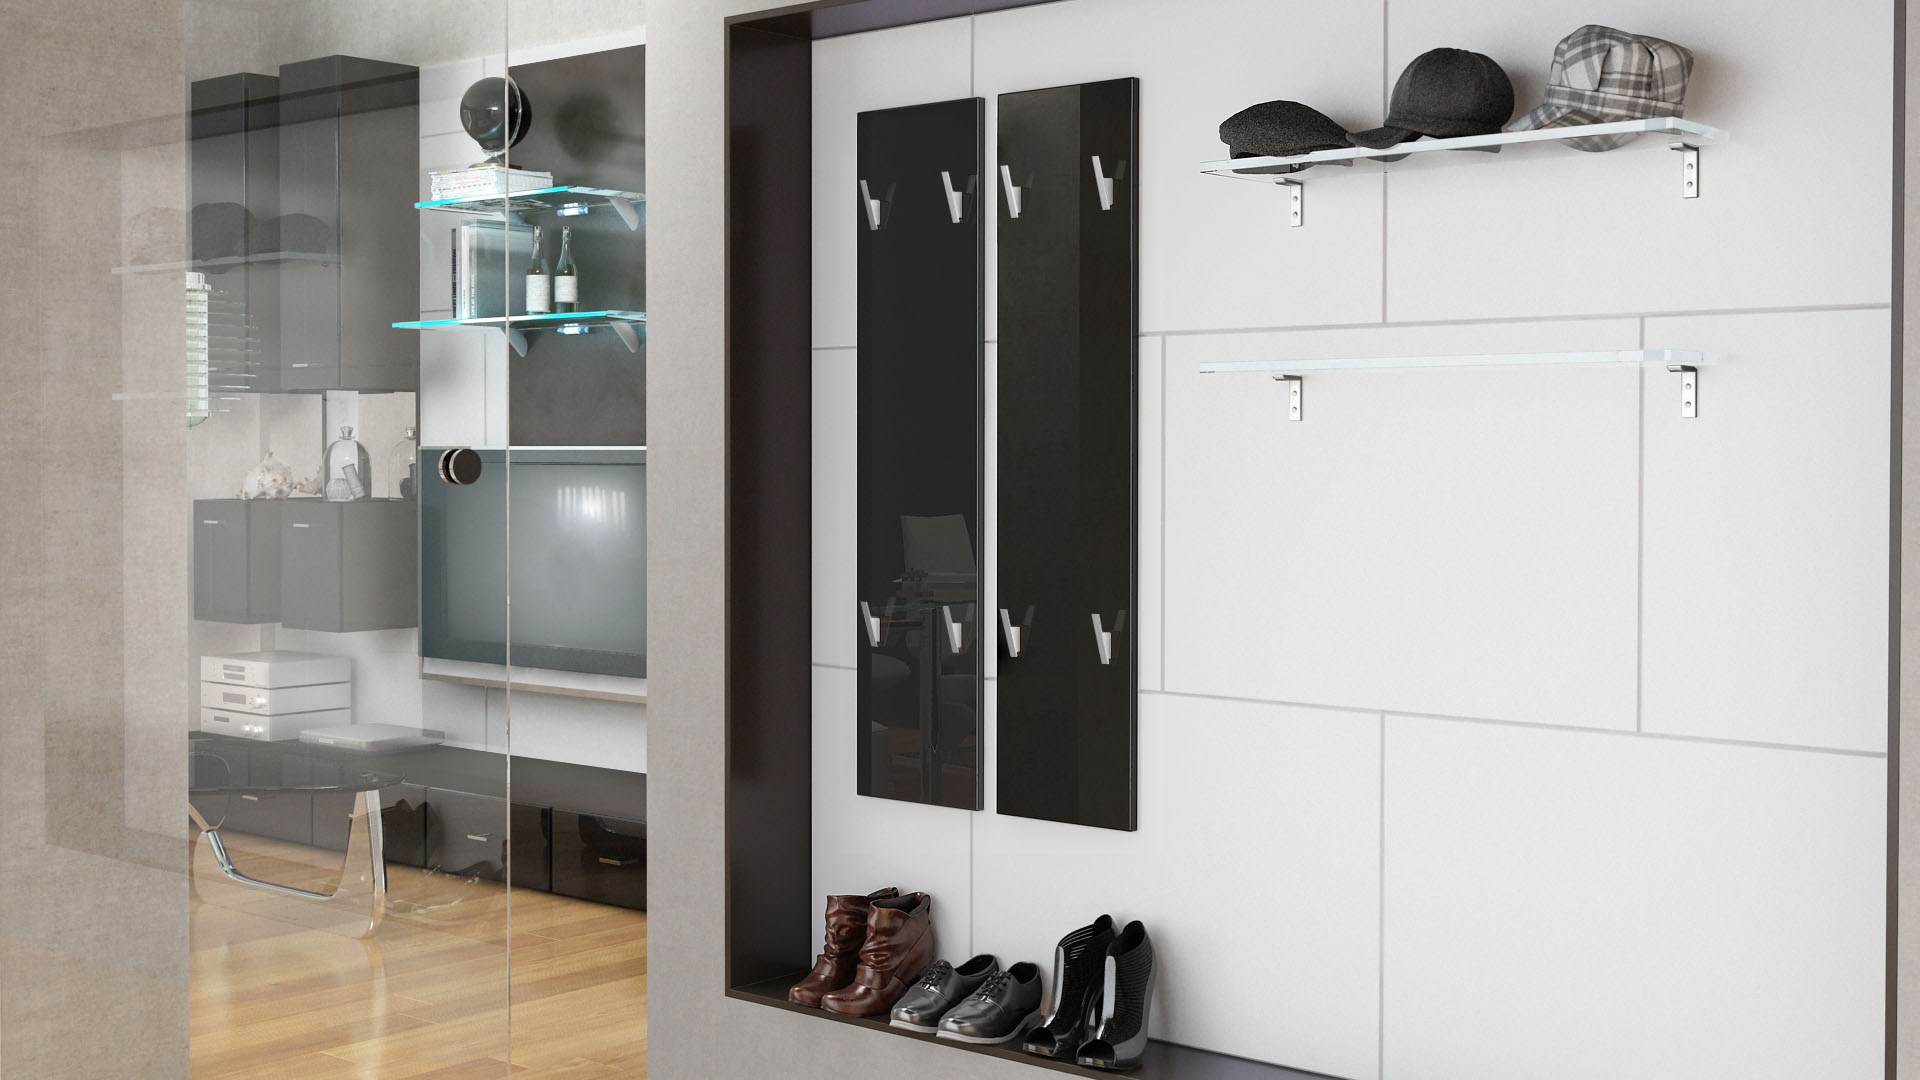 Garderobenpaneel wandgarderobe garderobe wandpaneel 120 for Garderobenpaneel schwarz hochglanz